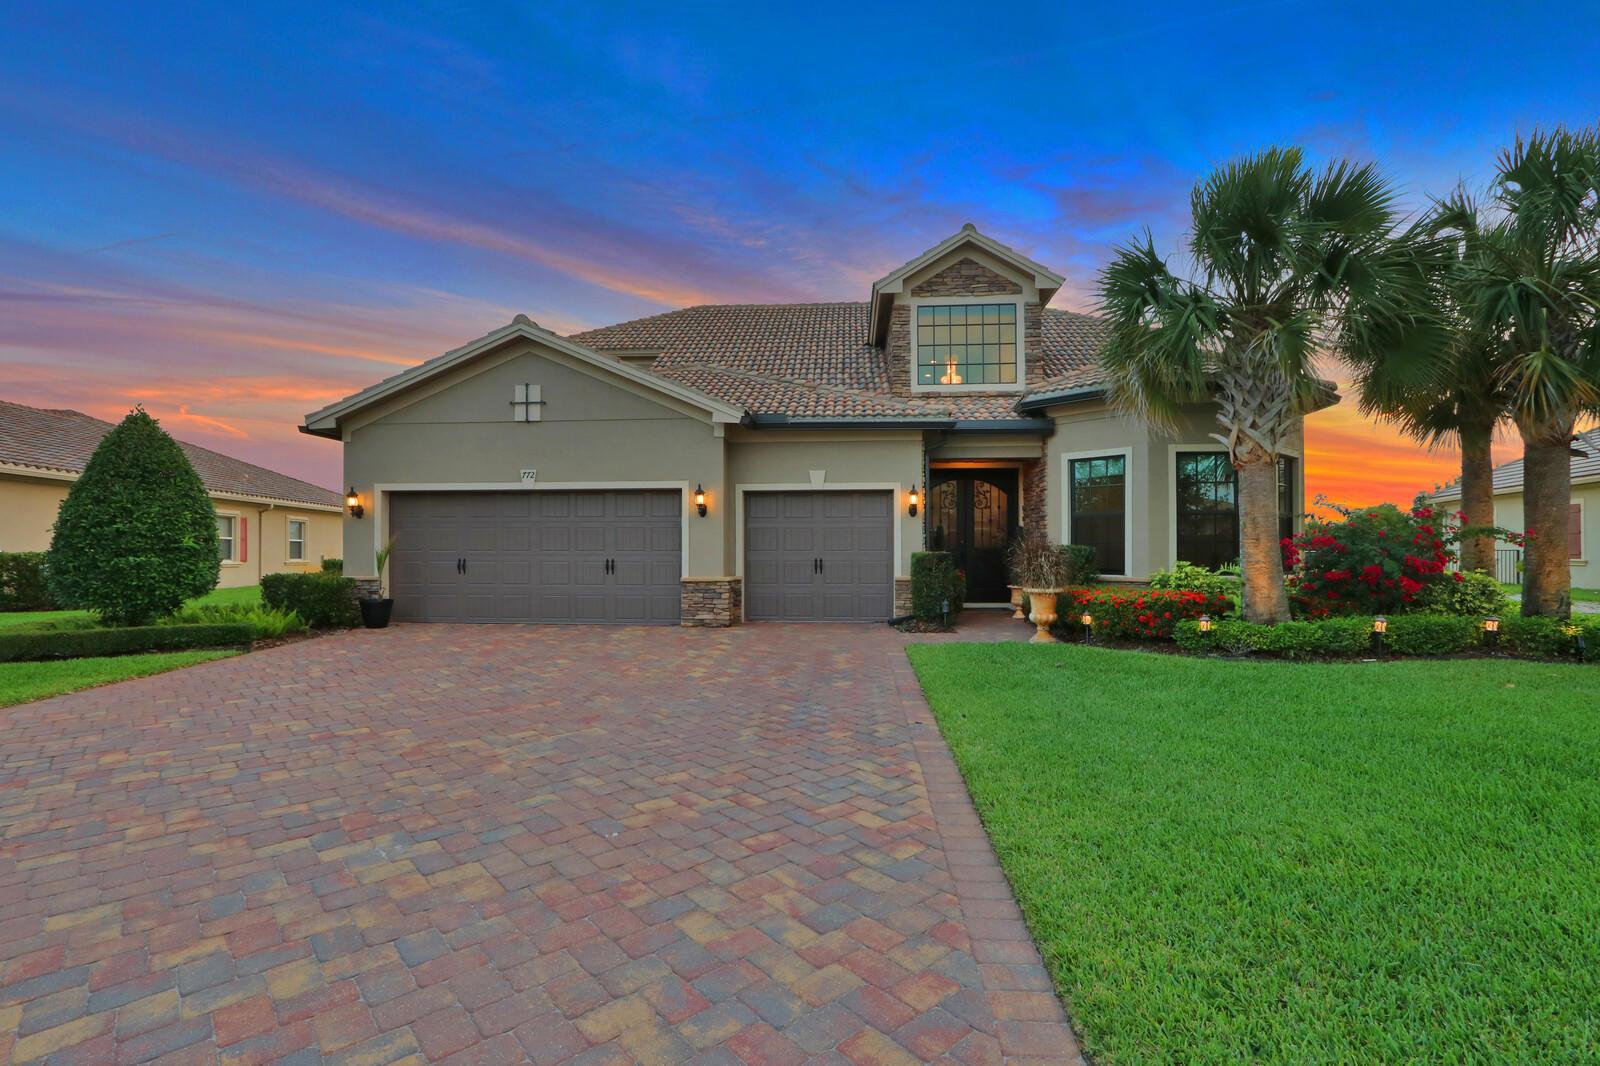 772 SW Habitat Lane  For Sale 10724900, FL